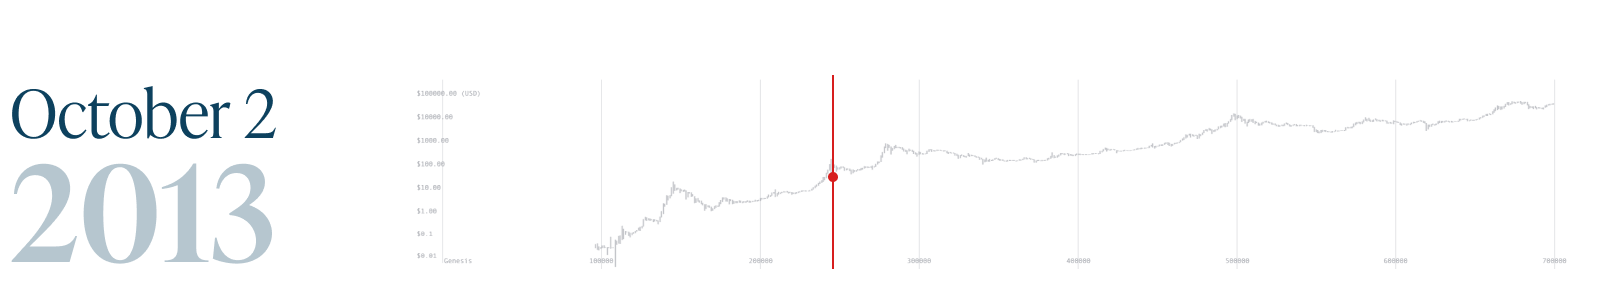 Monochrome_Bitcoin Block 700k_2 Oct 2013.png